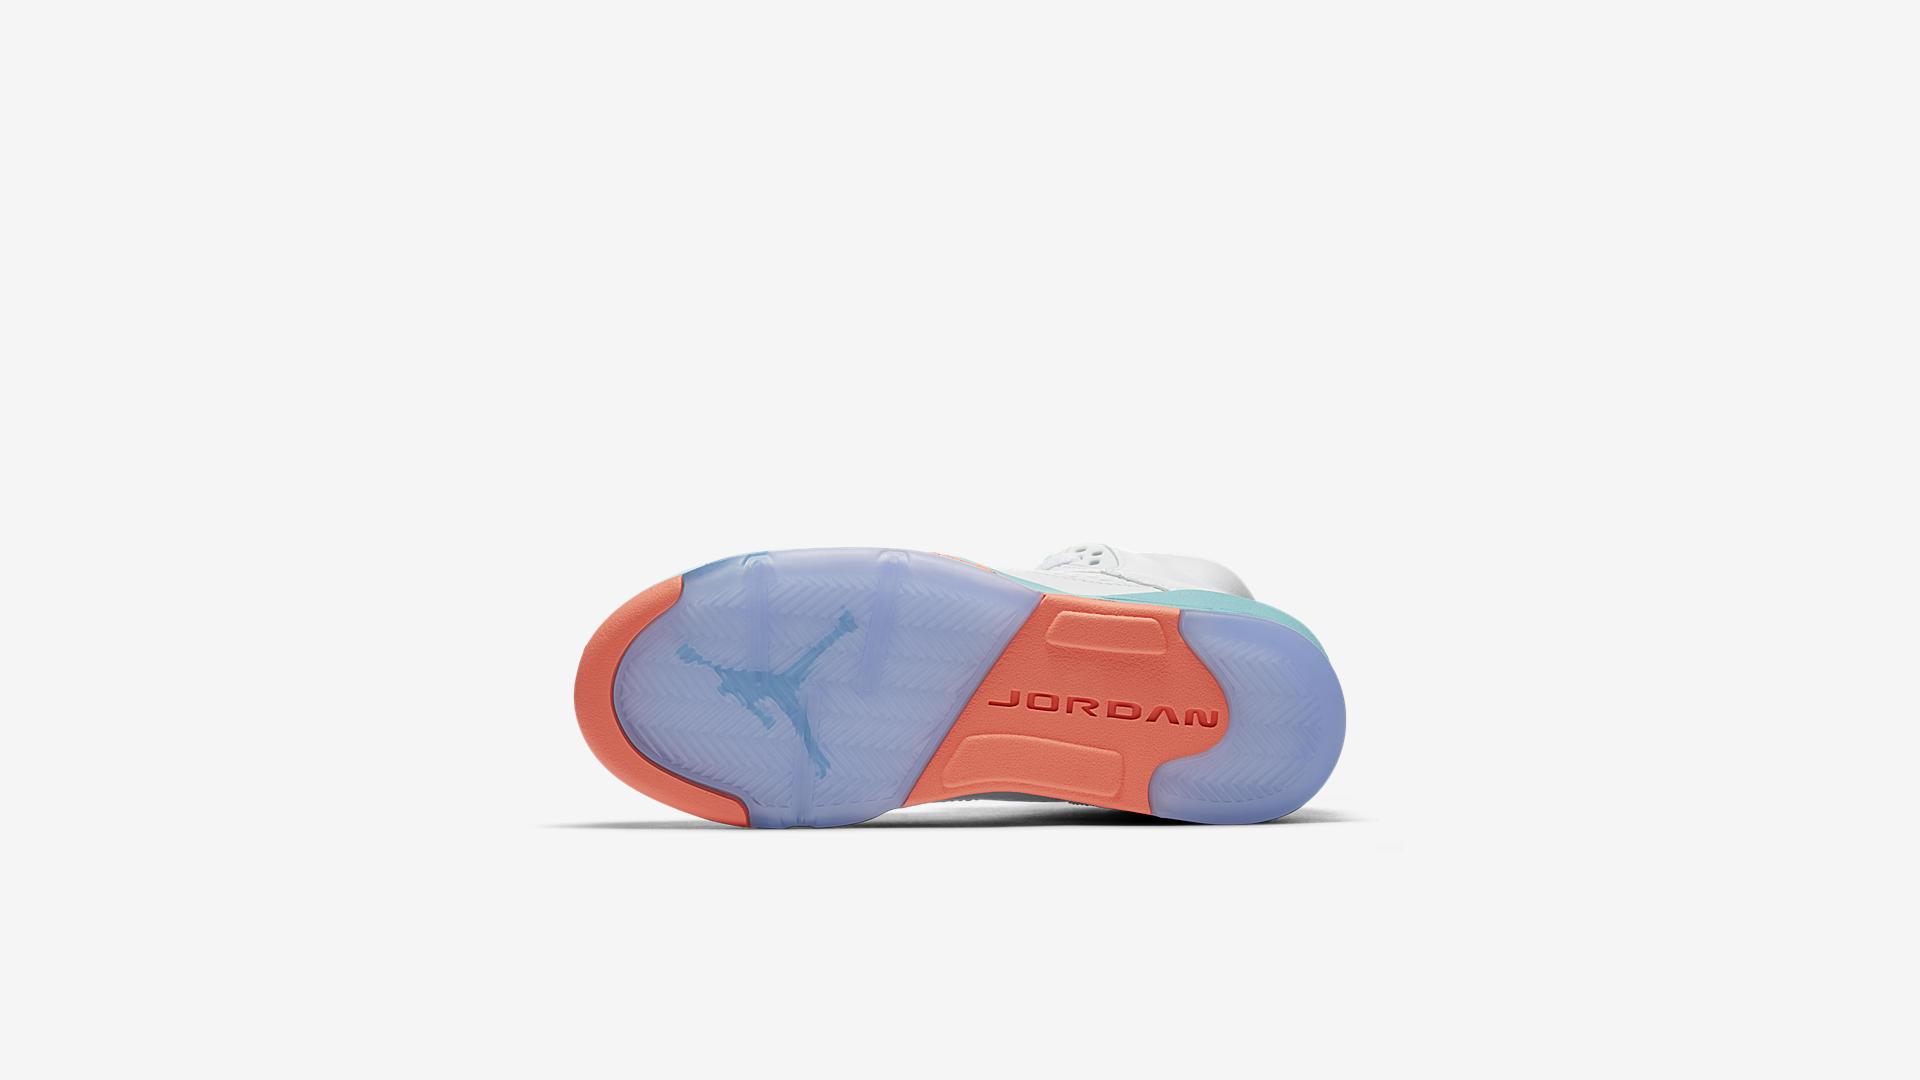 Air Jordan V 'Light Aqua' Wit/Light Aqua/Zwart/Crimson Pulse (440892-100)